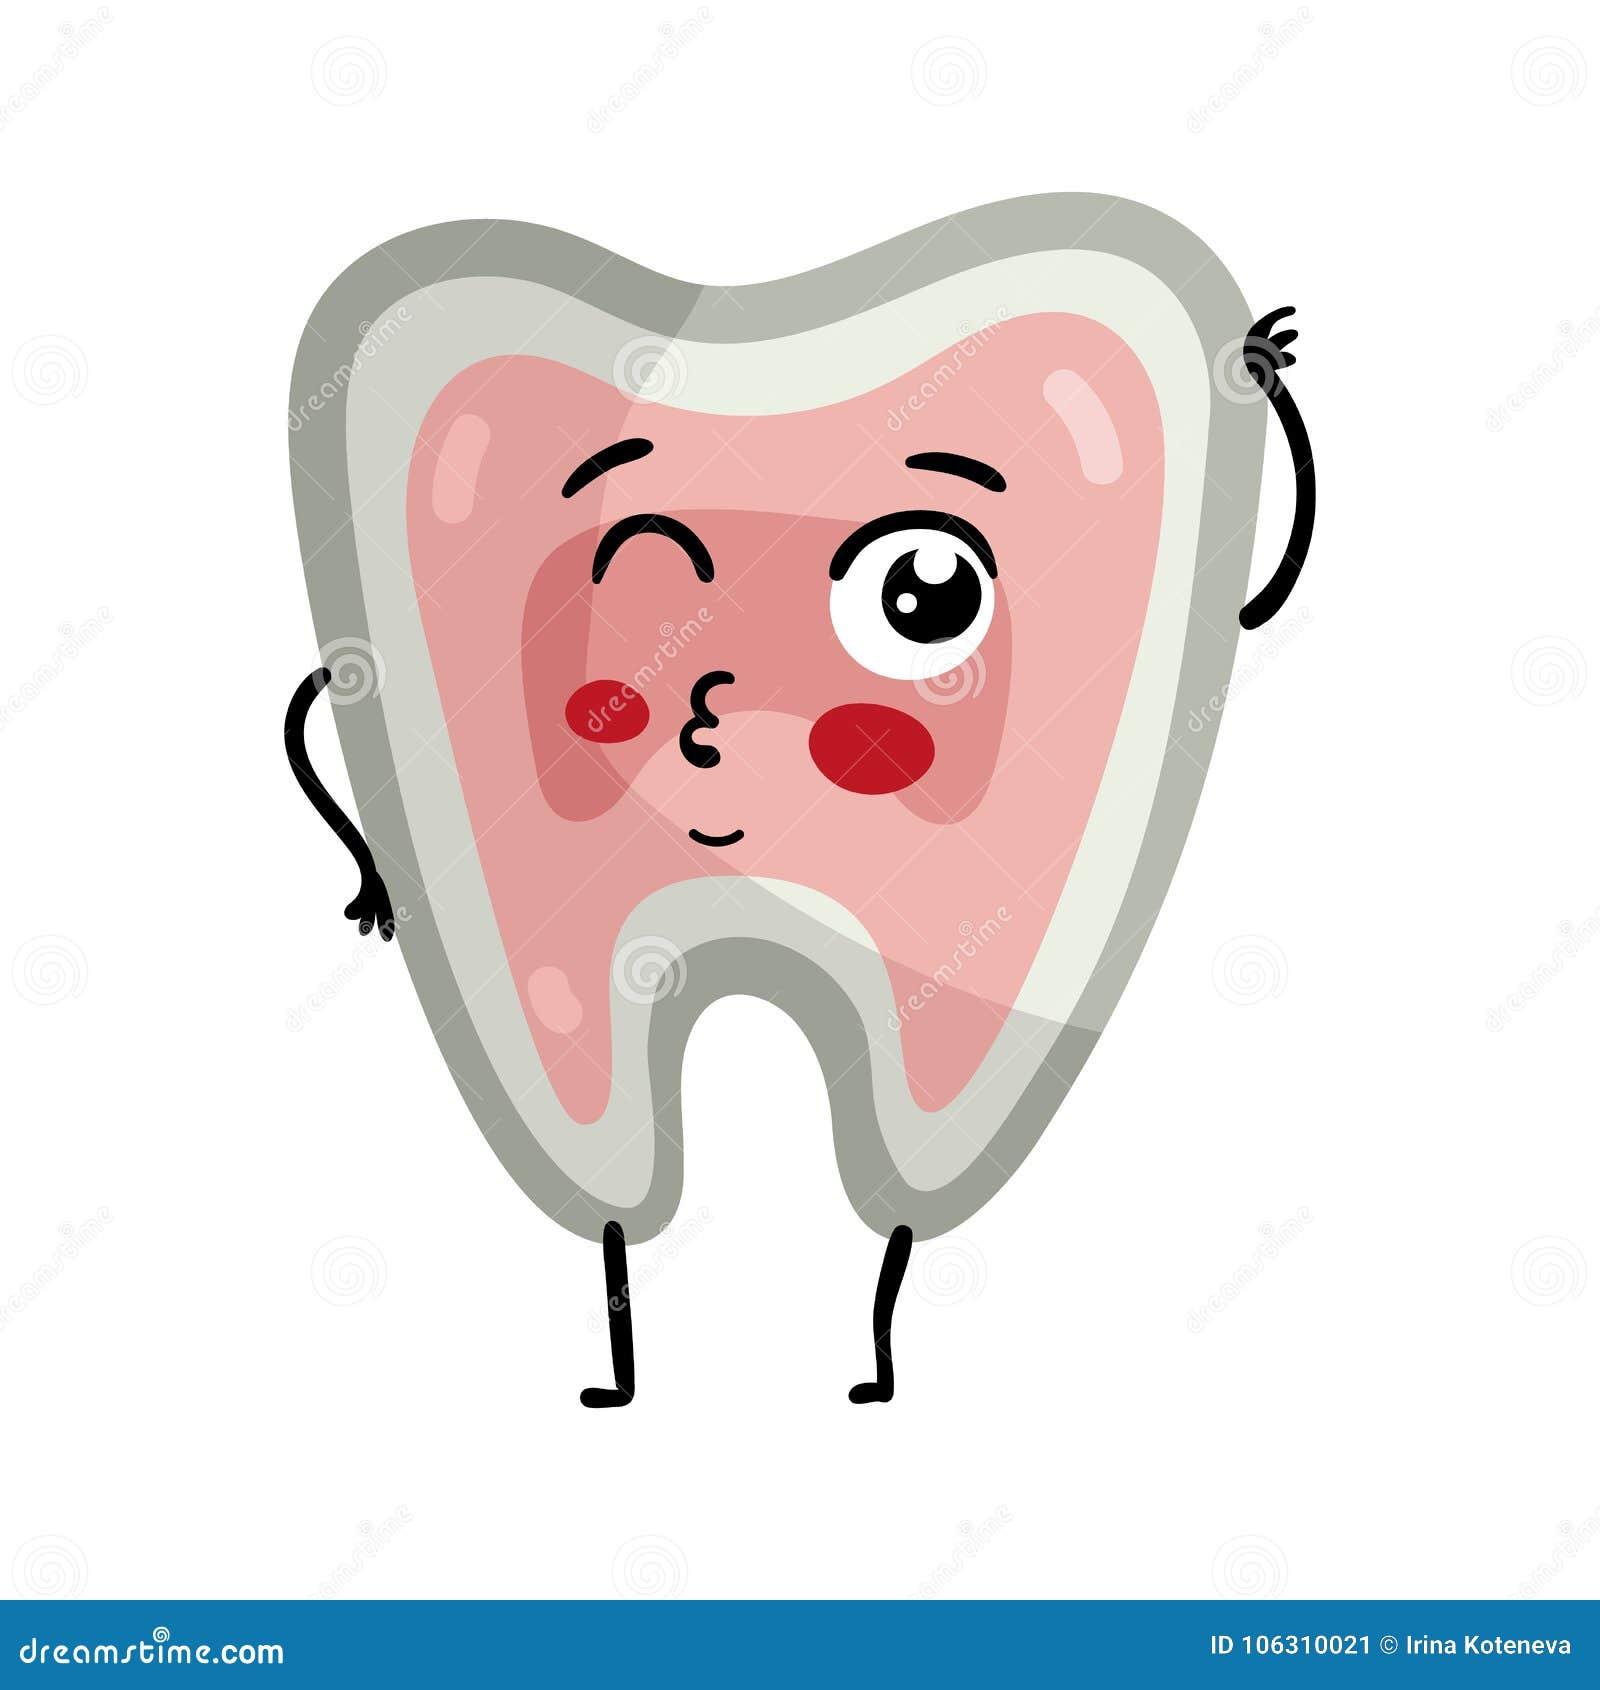 Human Tooth Cute Cartoon Character Stock Vector - Illustration of ...